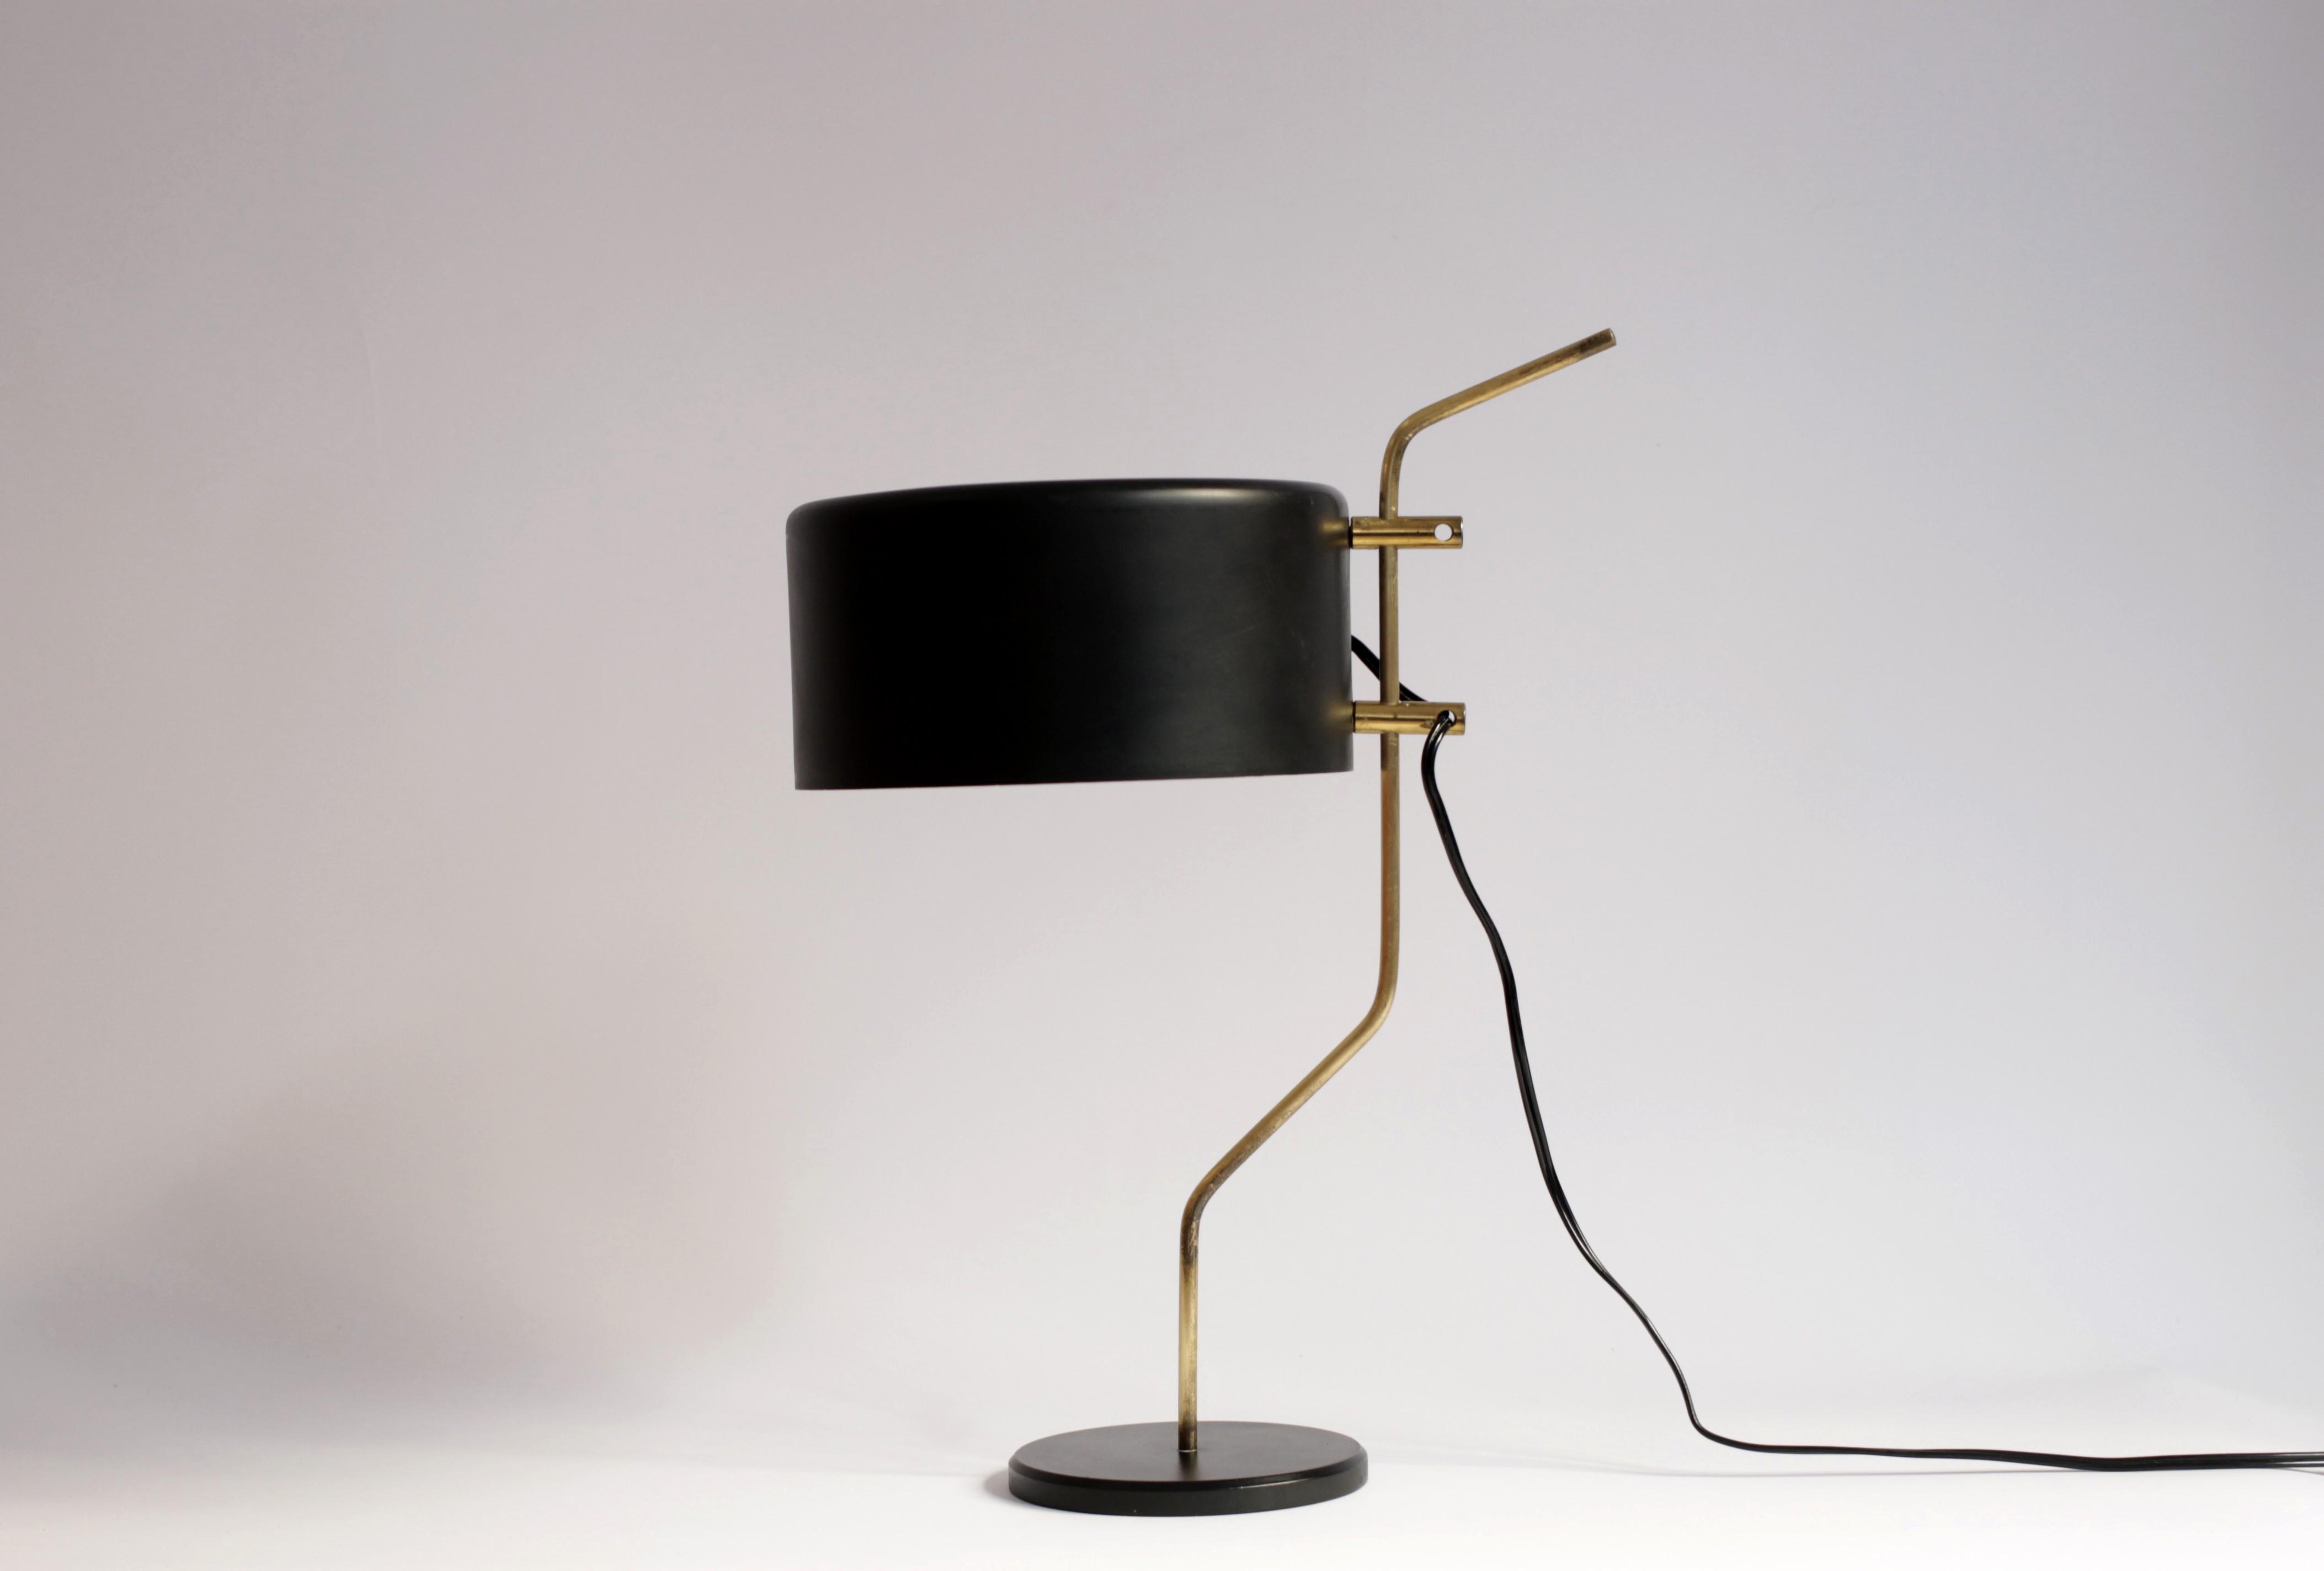 Lunel Desk Lamp In Brass And Black Metal 1950s Design Market